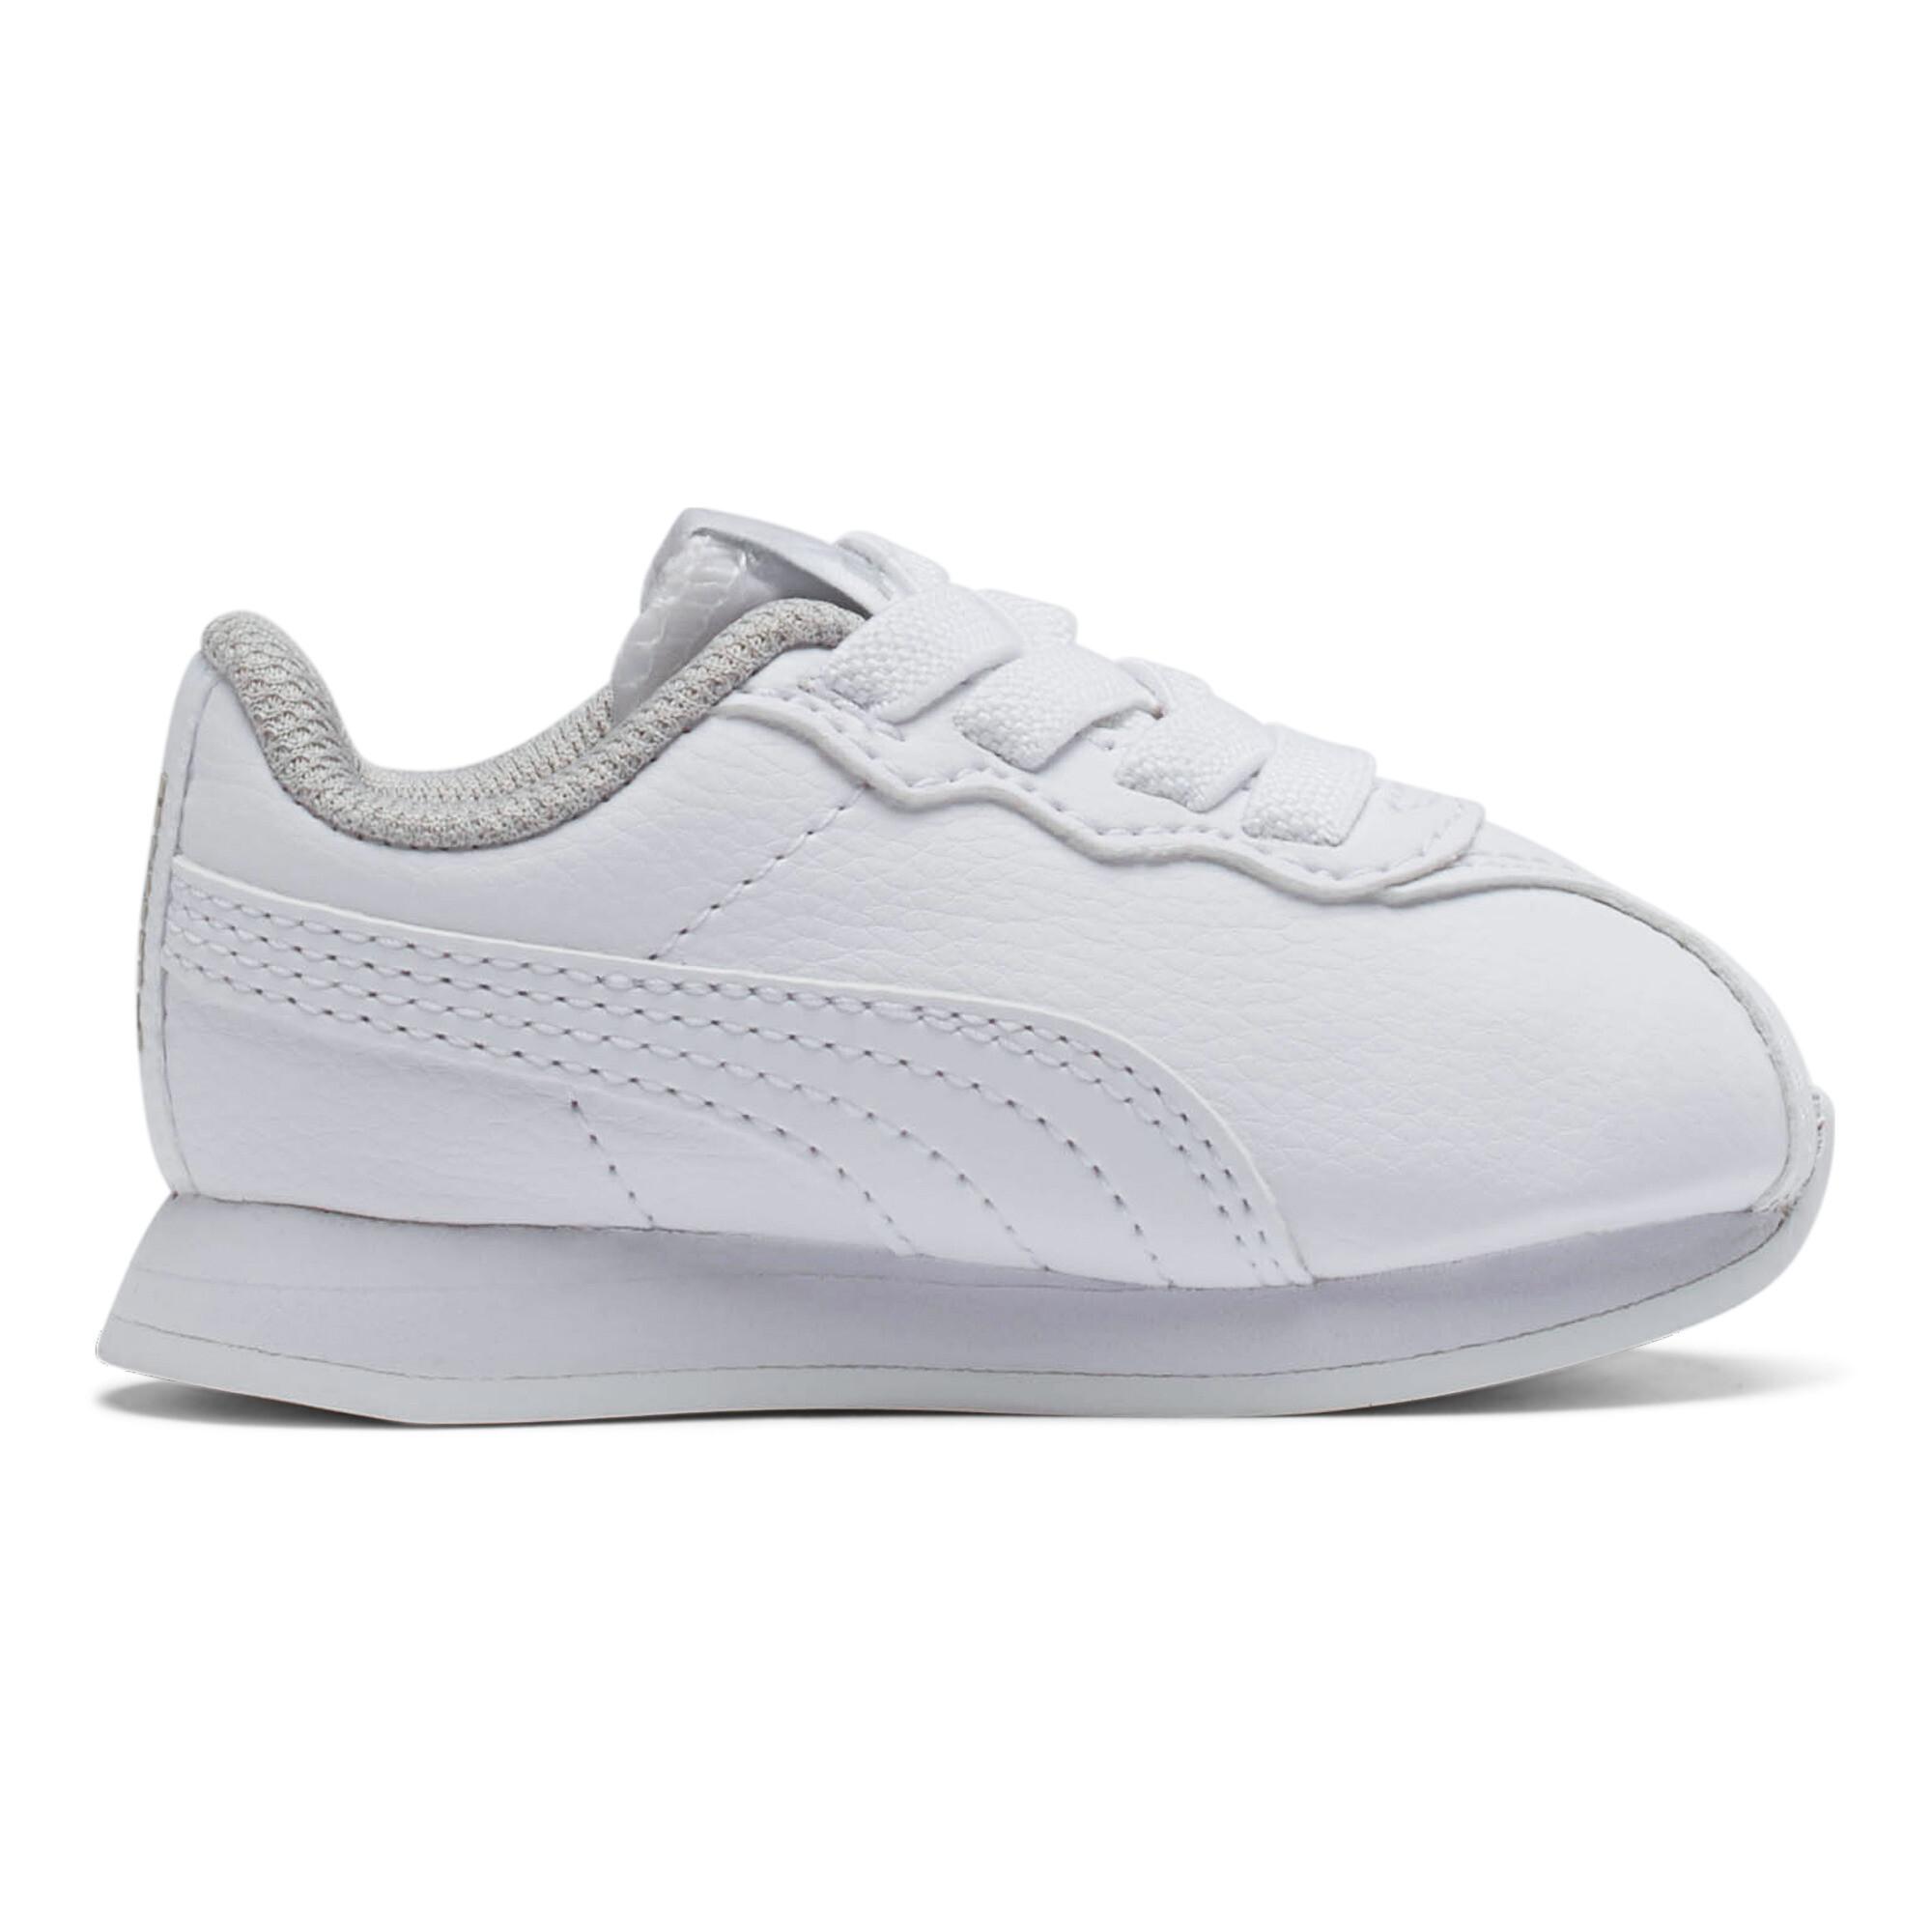 PUMA-Turin-II-AC-Toddler-Shoes-Unisex-Shoe-Kids thumbnail 6